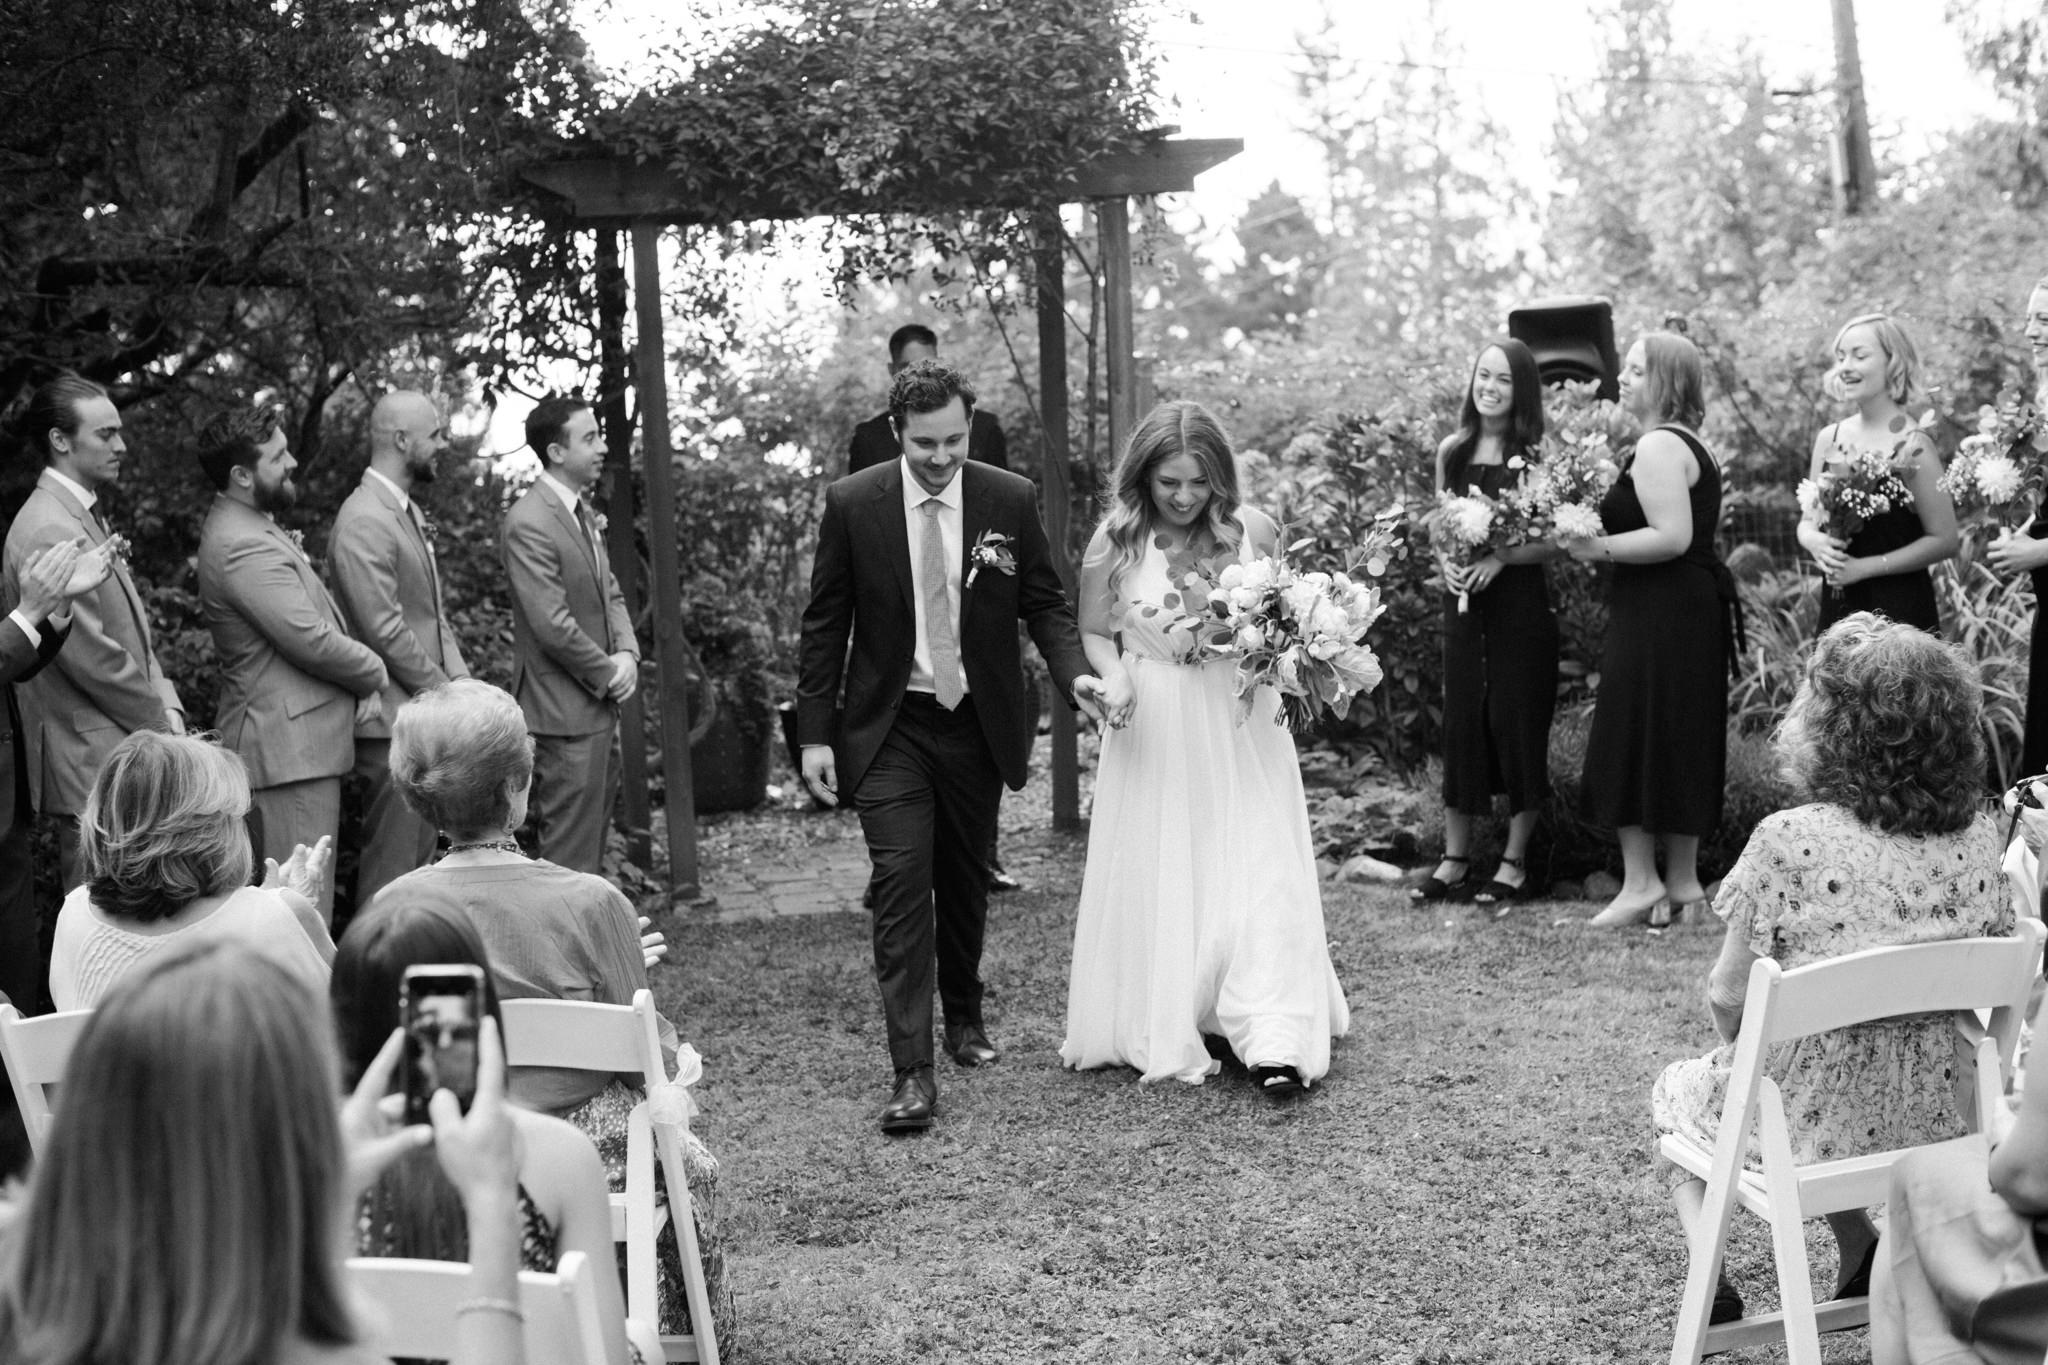 Backyard-Bainbridge-Island-Wedding-Alycia-Lovell-Photography-119.JPG